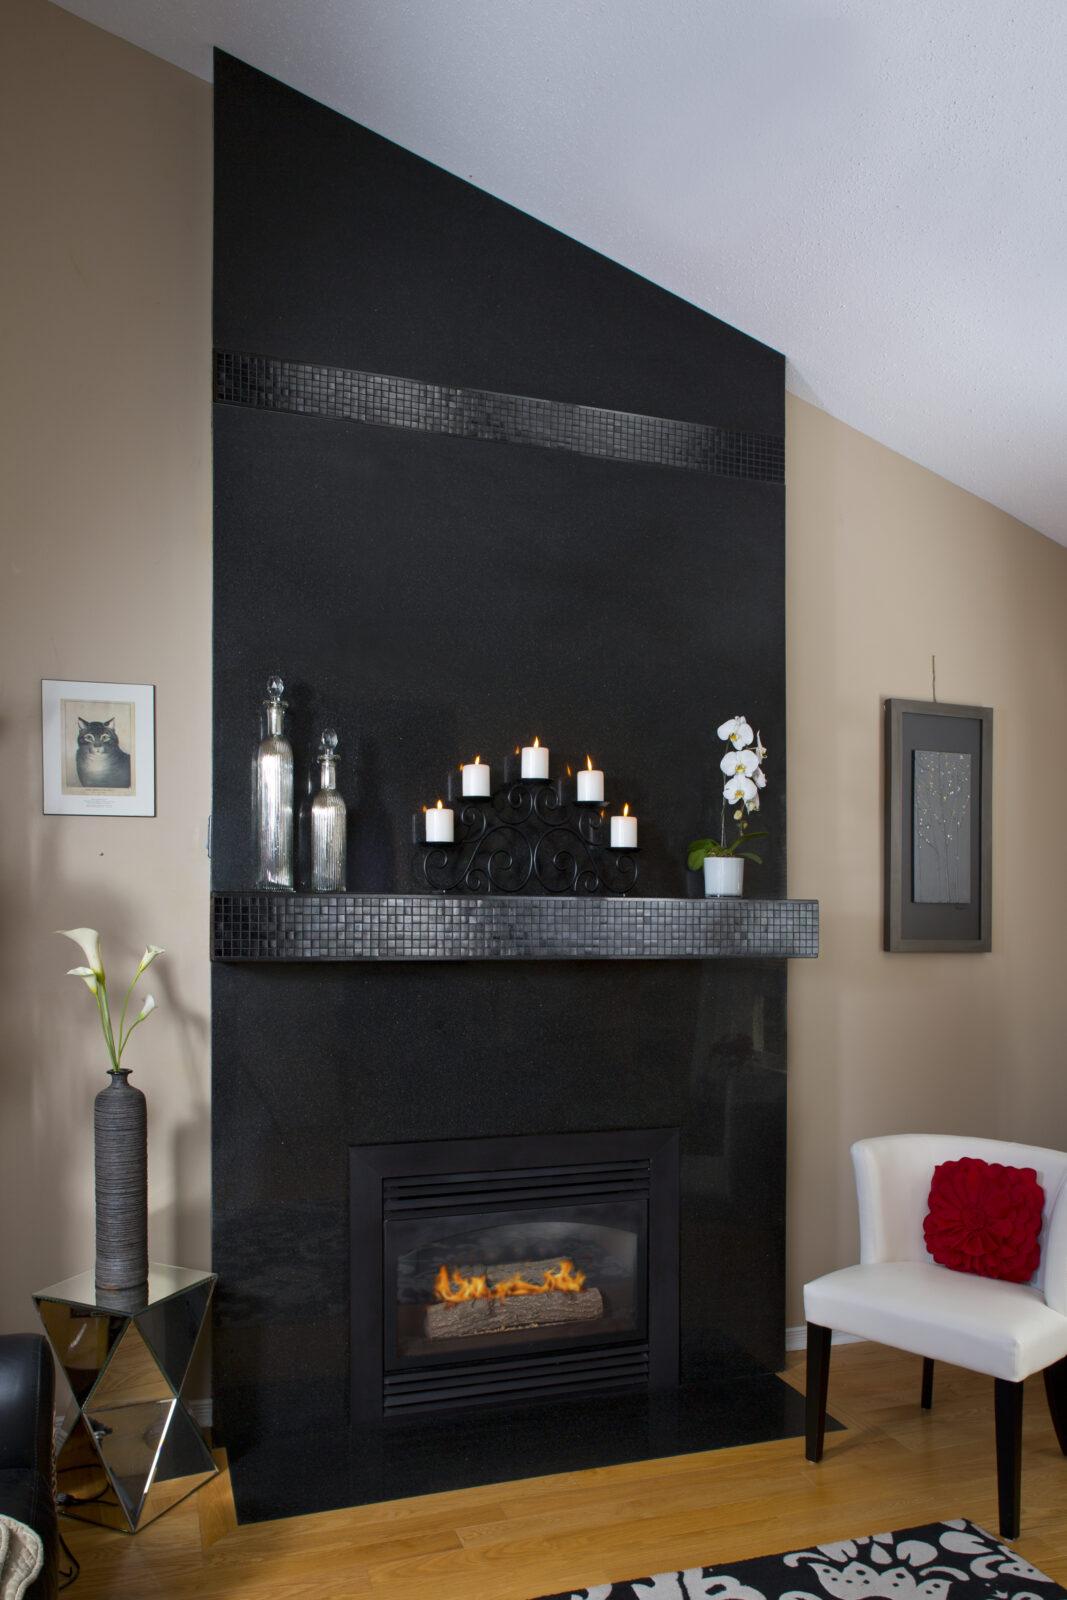 Places You Can Use Granite Or Mosaic Tiles Granite